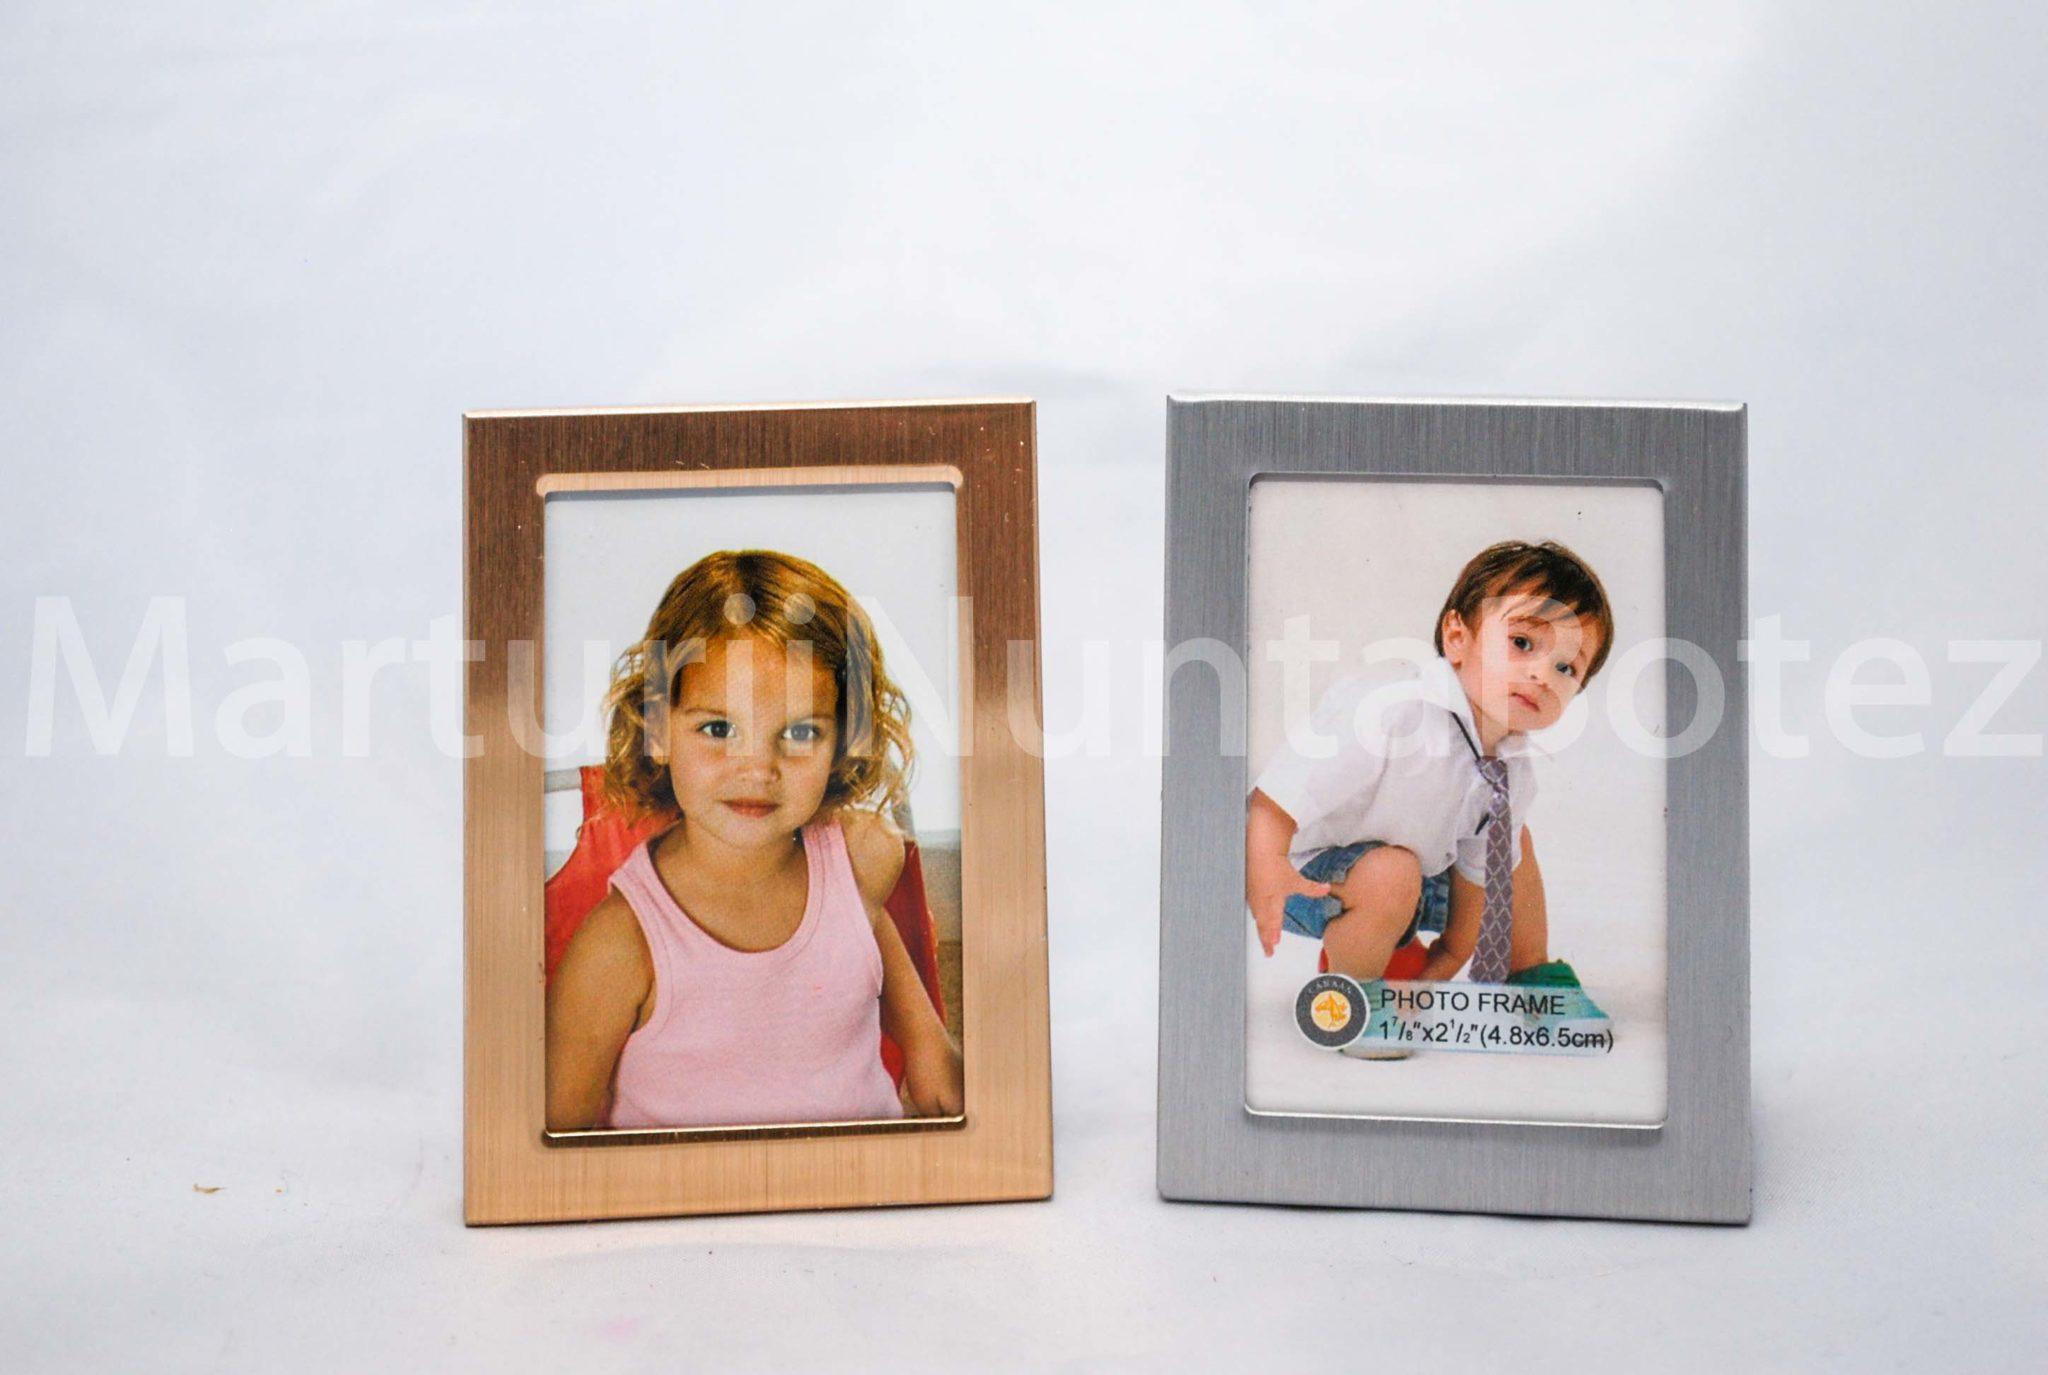 marturii_nunta_marturie_botez_rama_foto_calitate_superioara_patrat5